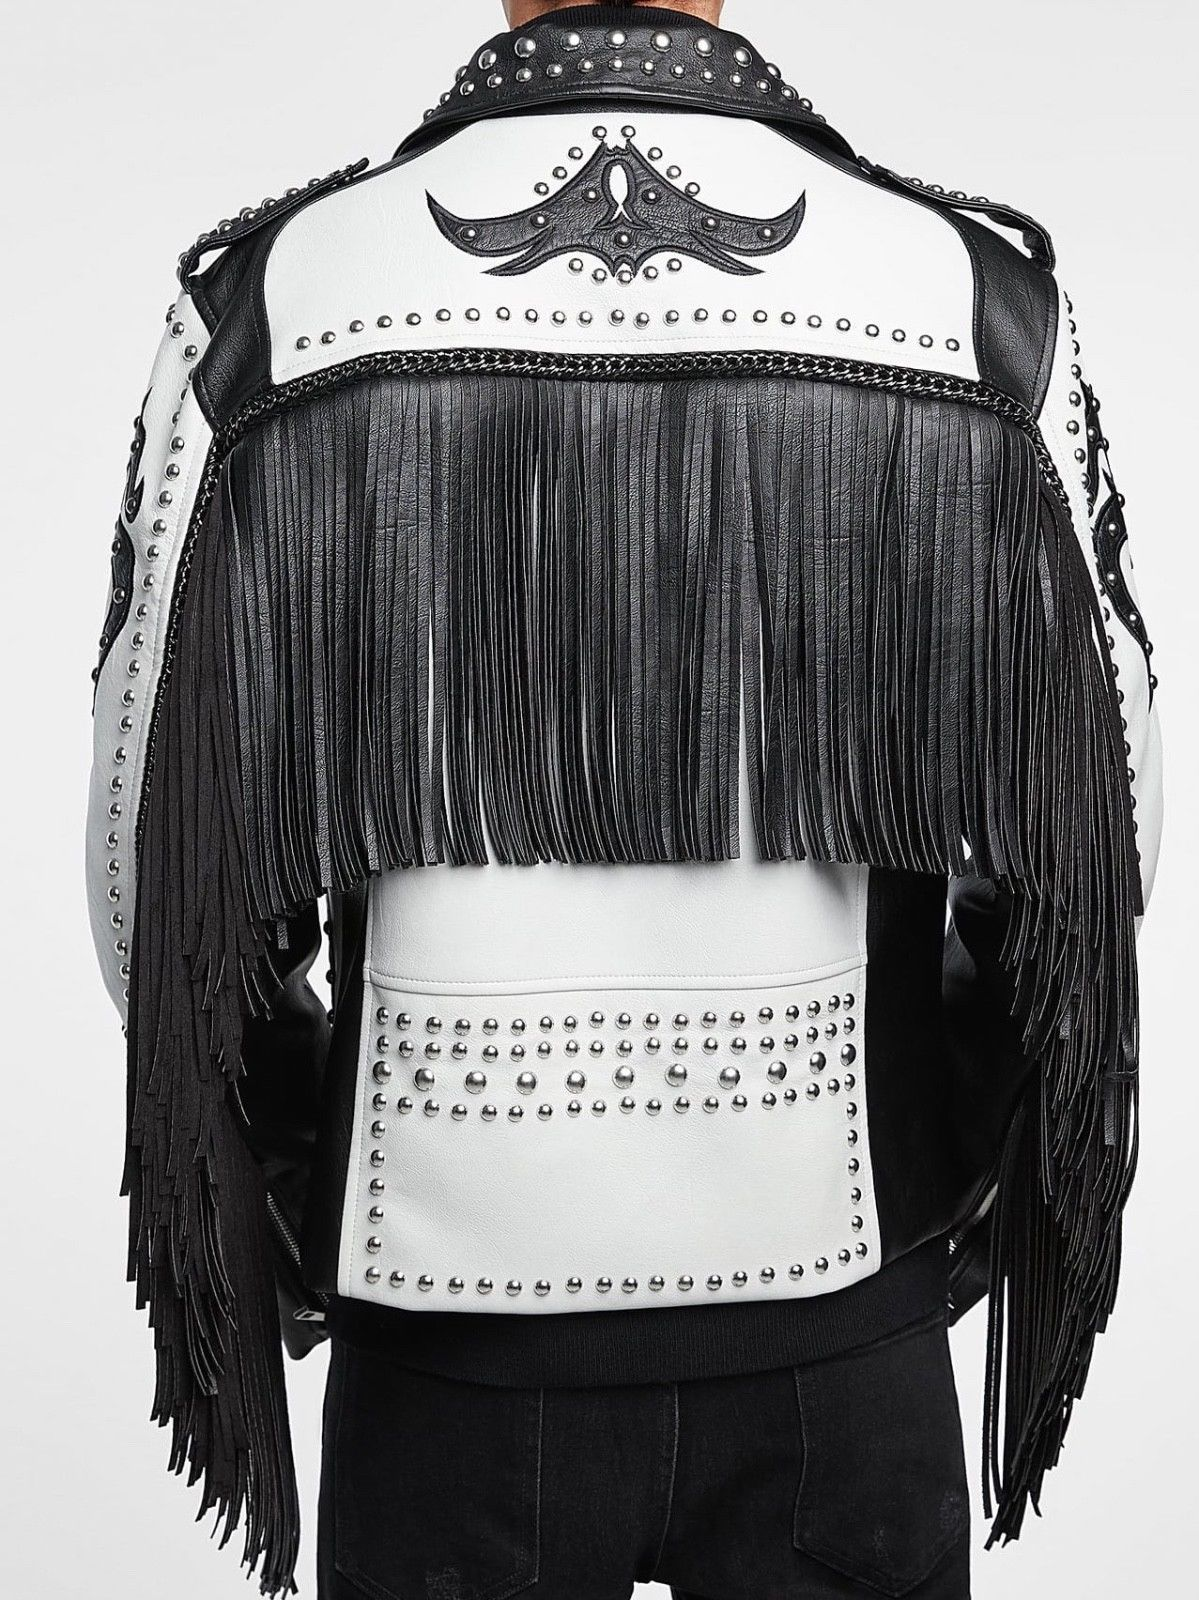 Handmade Black & White Jacket Silver Studded Fringe Zip